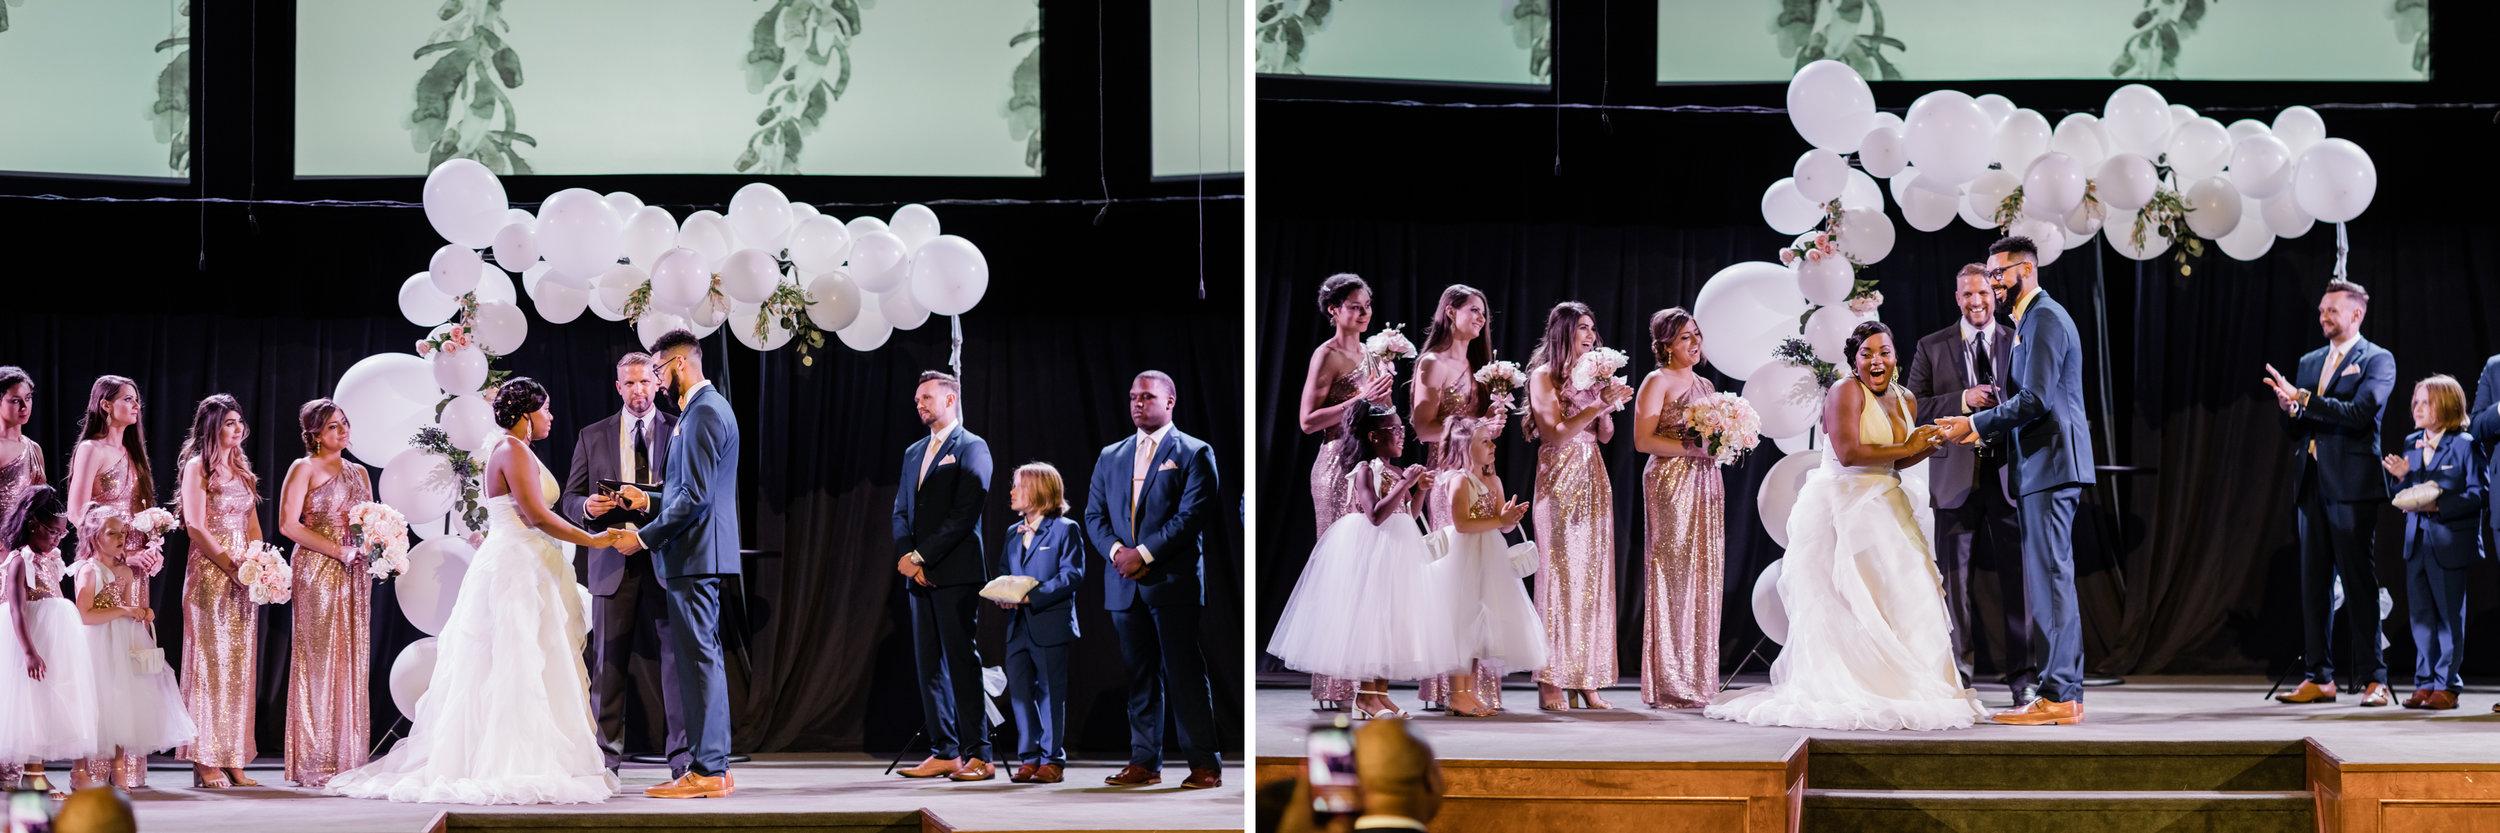 Kansas City Wedding Photographer 54.jpg